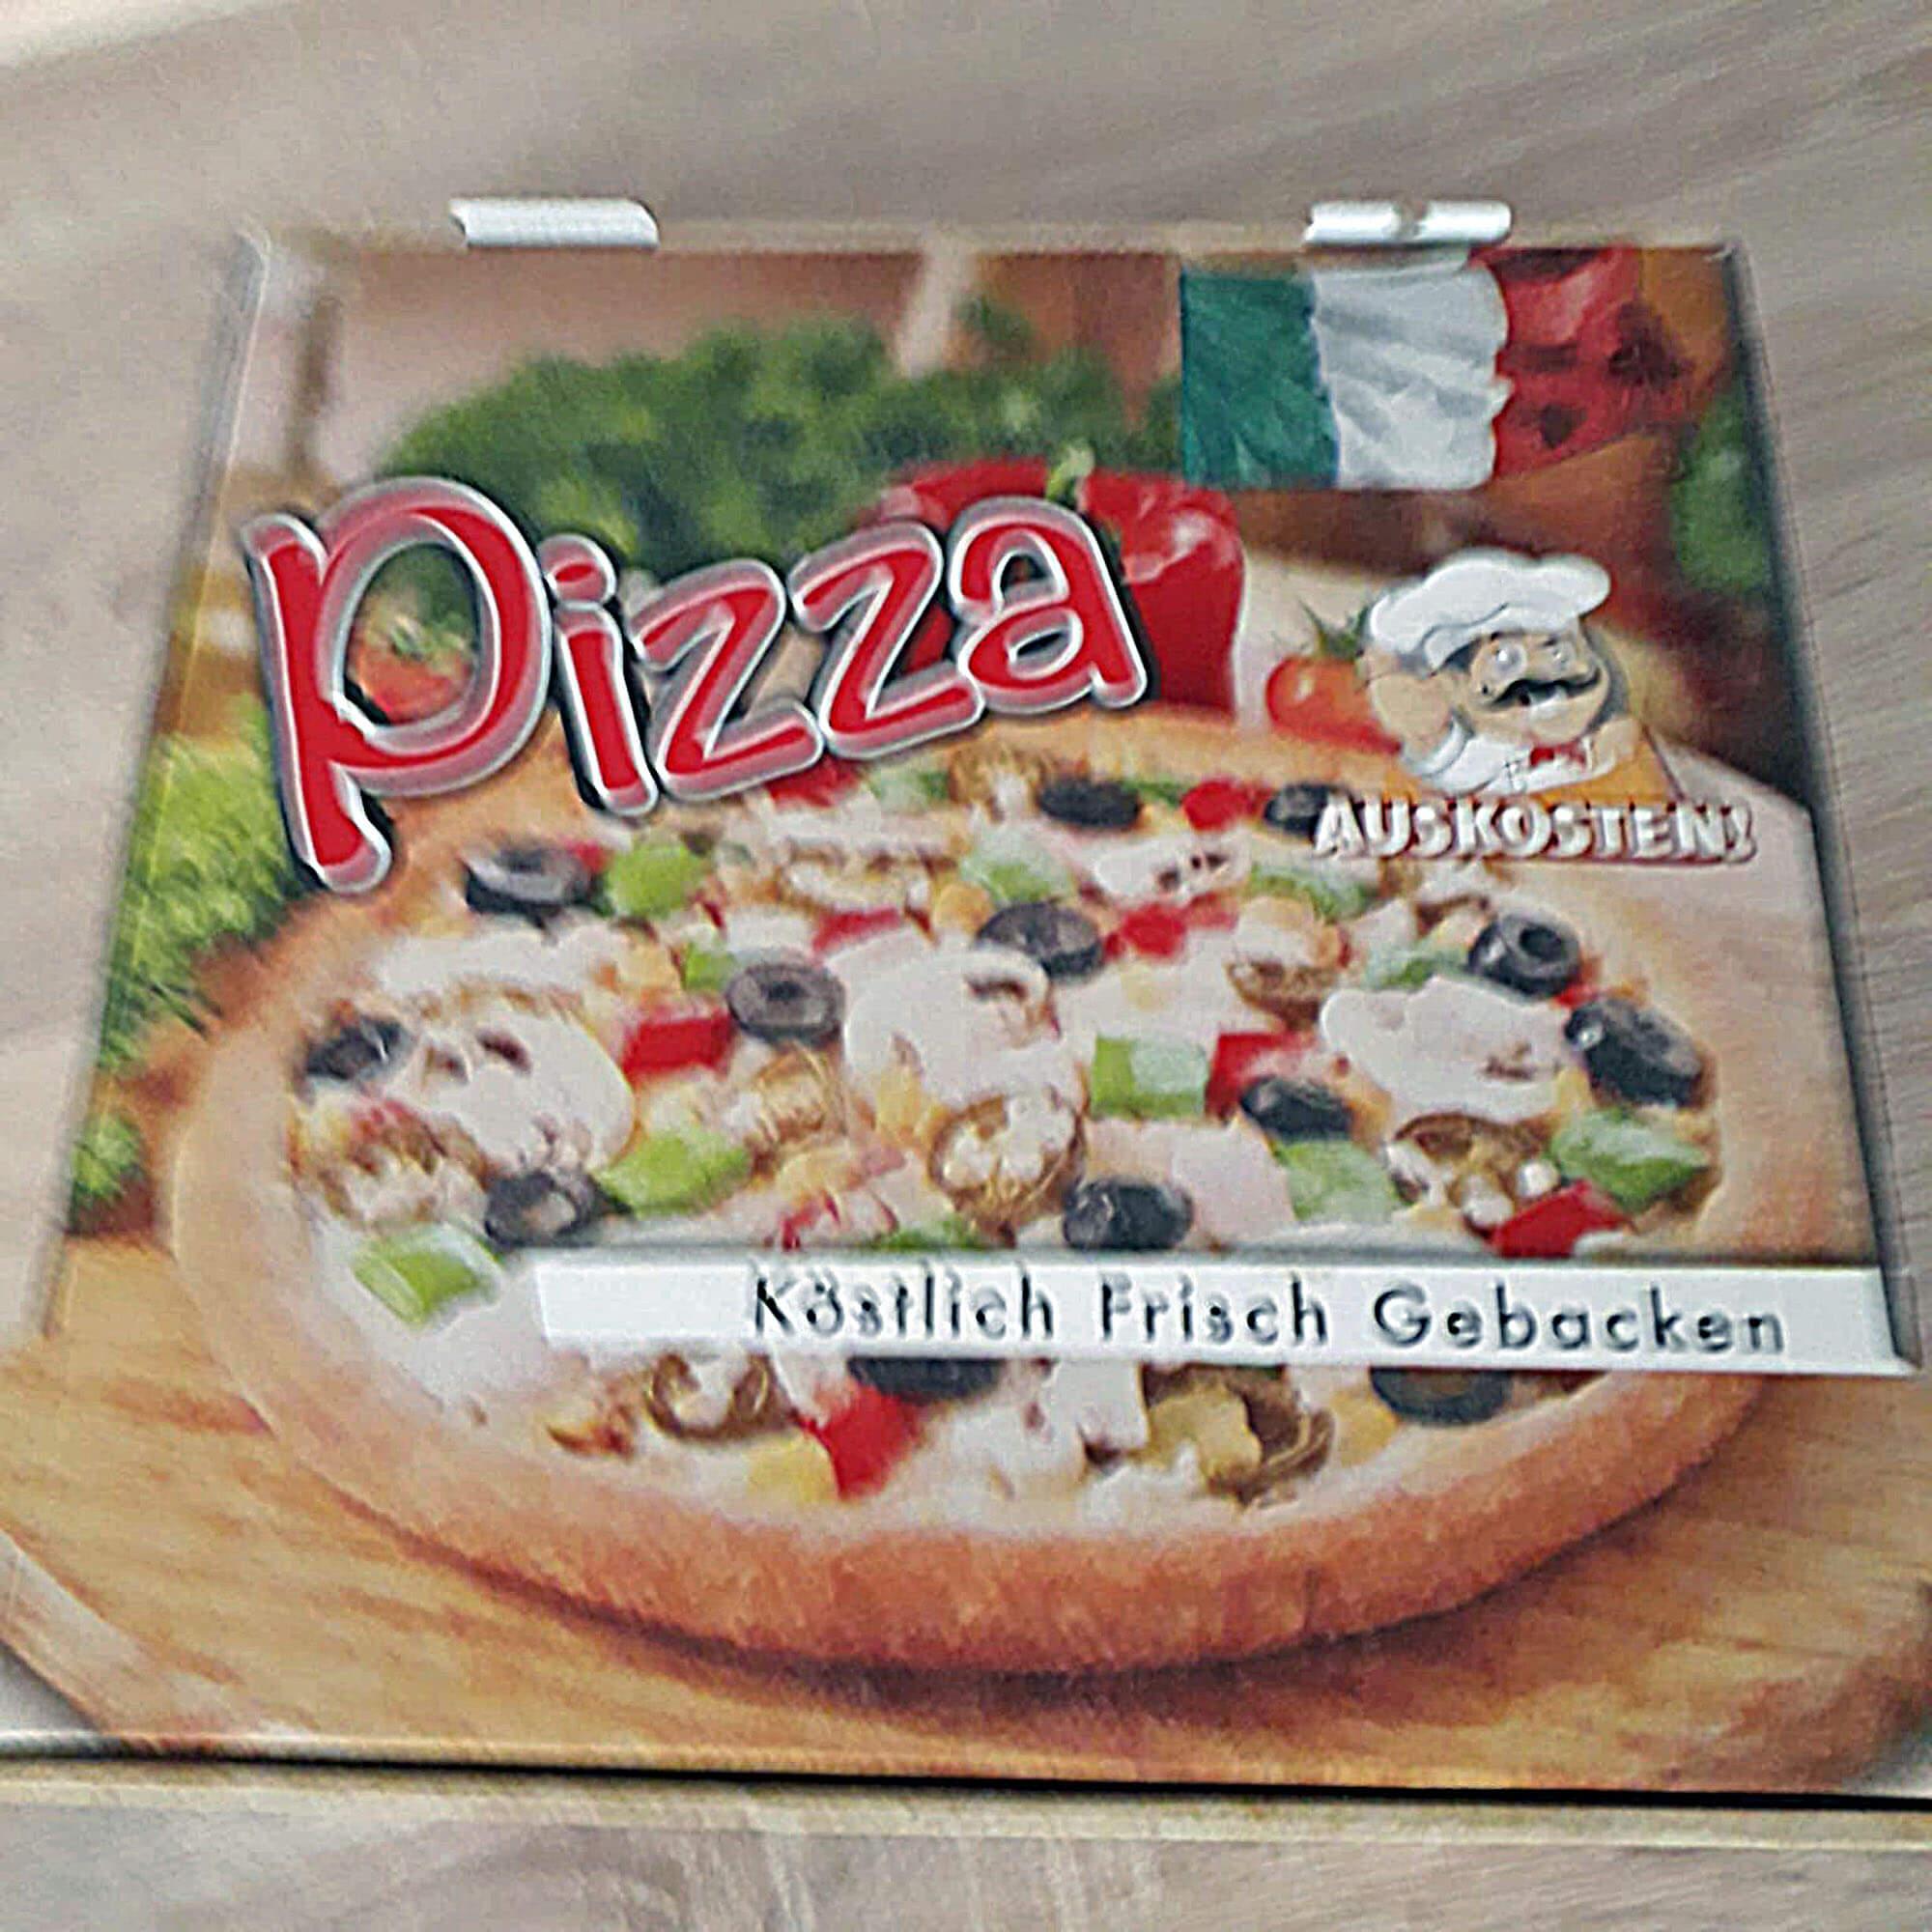 20c Pizzakarton, R.Koss